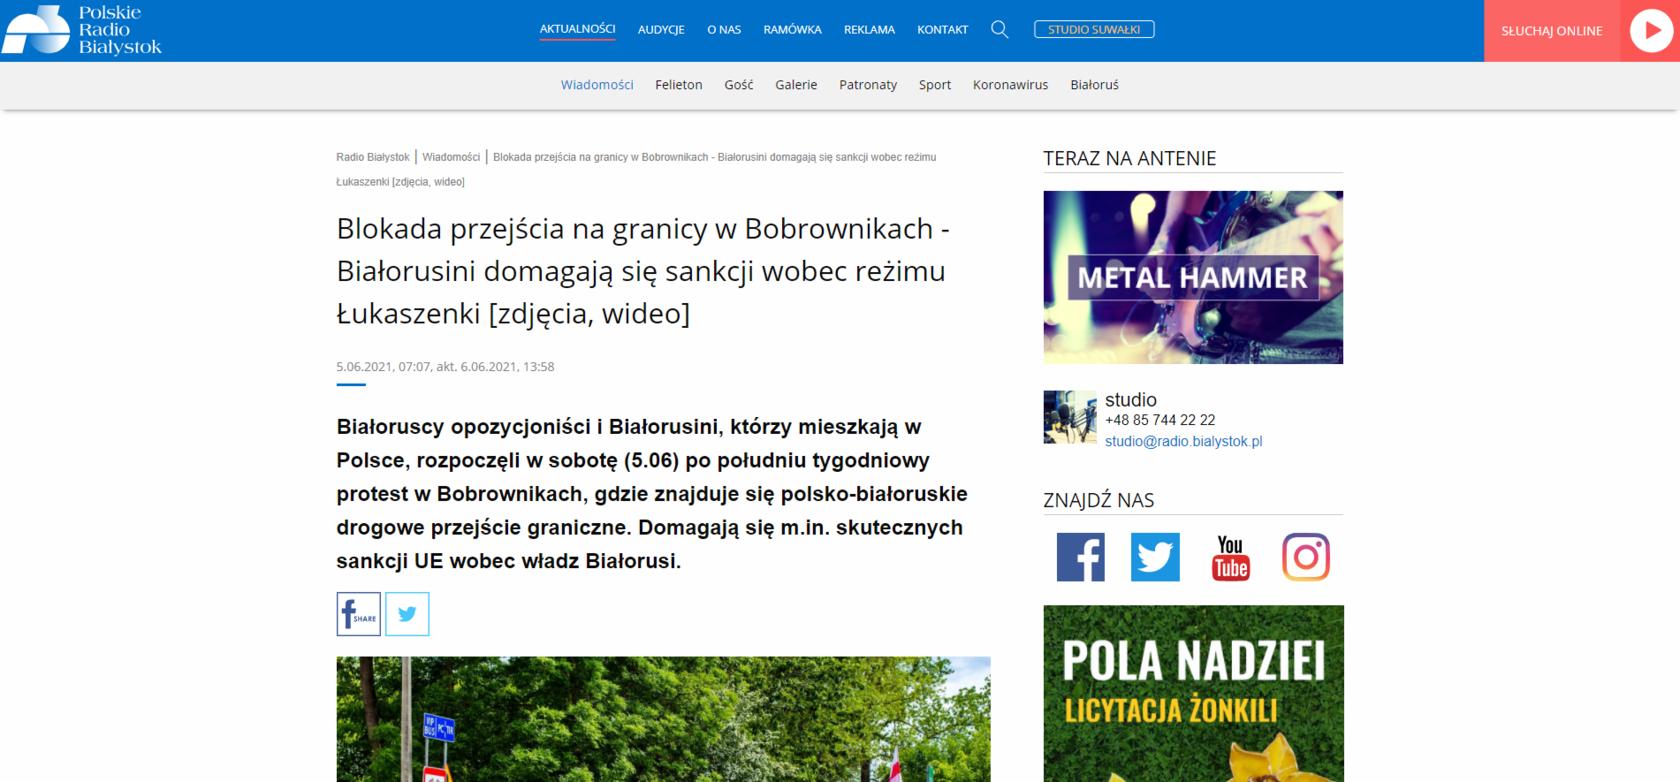 Radio Bialystok